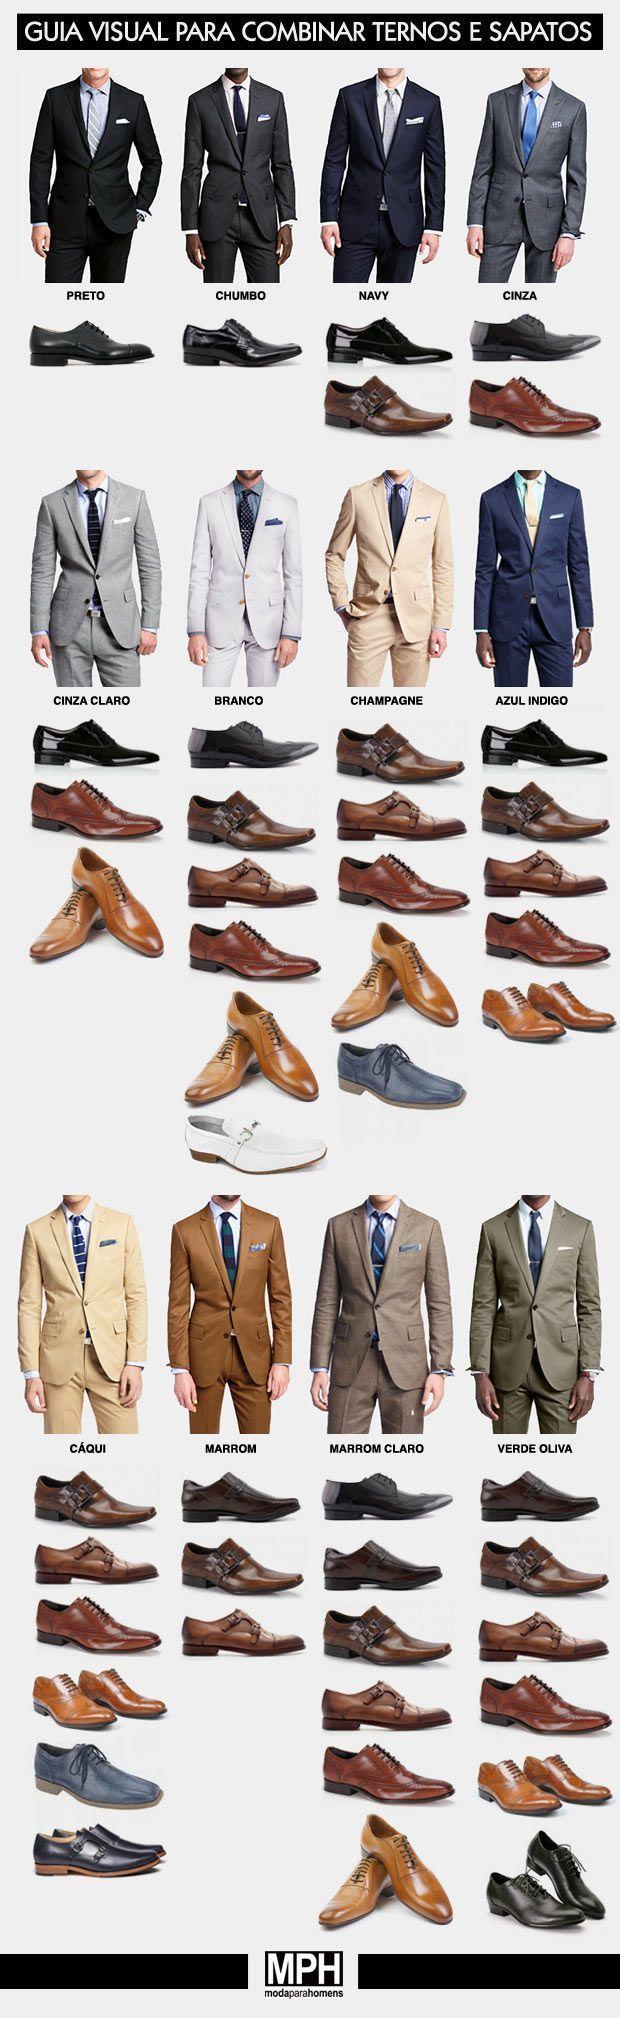 Suit and shoe pairings: Guia visual para combinar ternos e sapatos